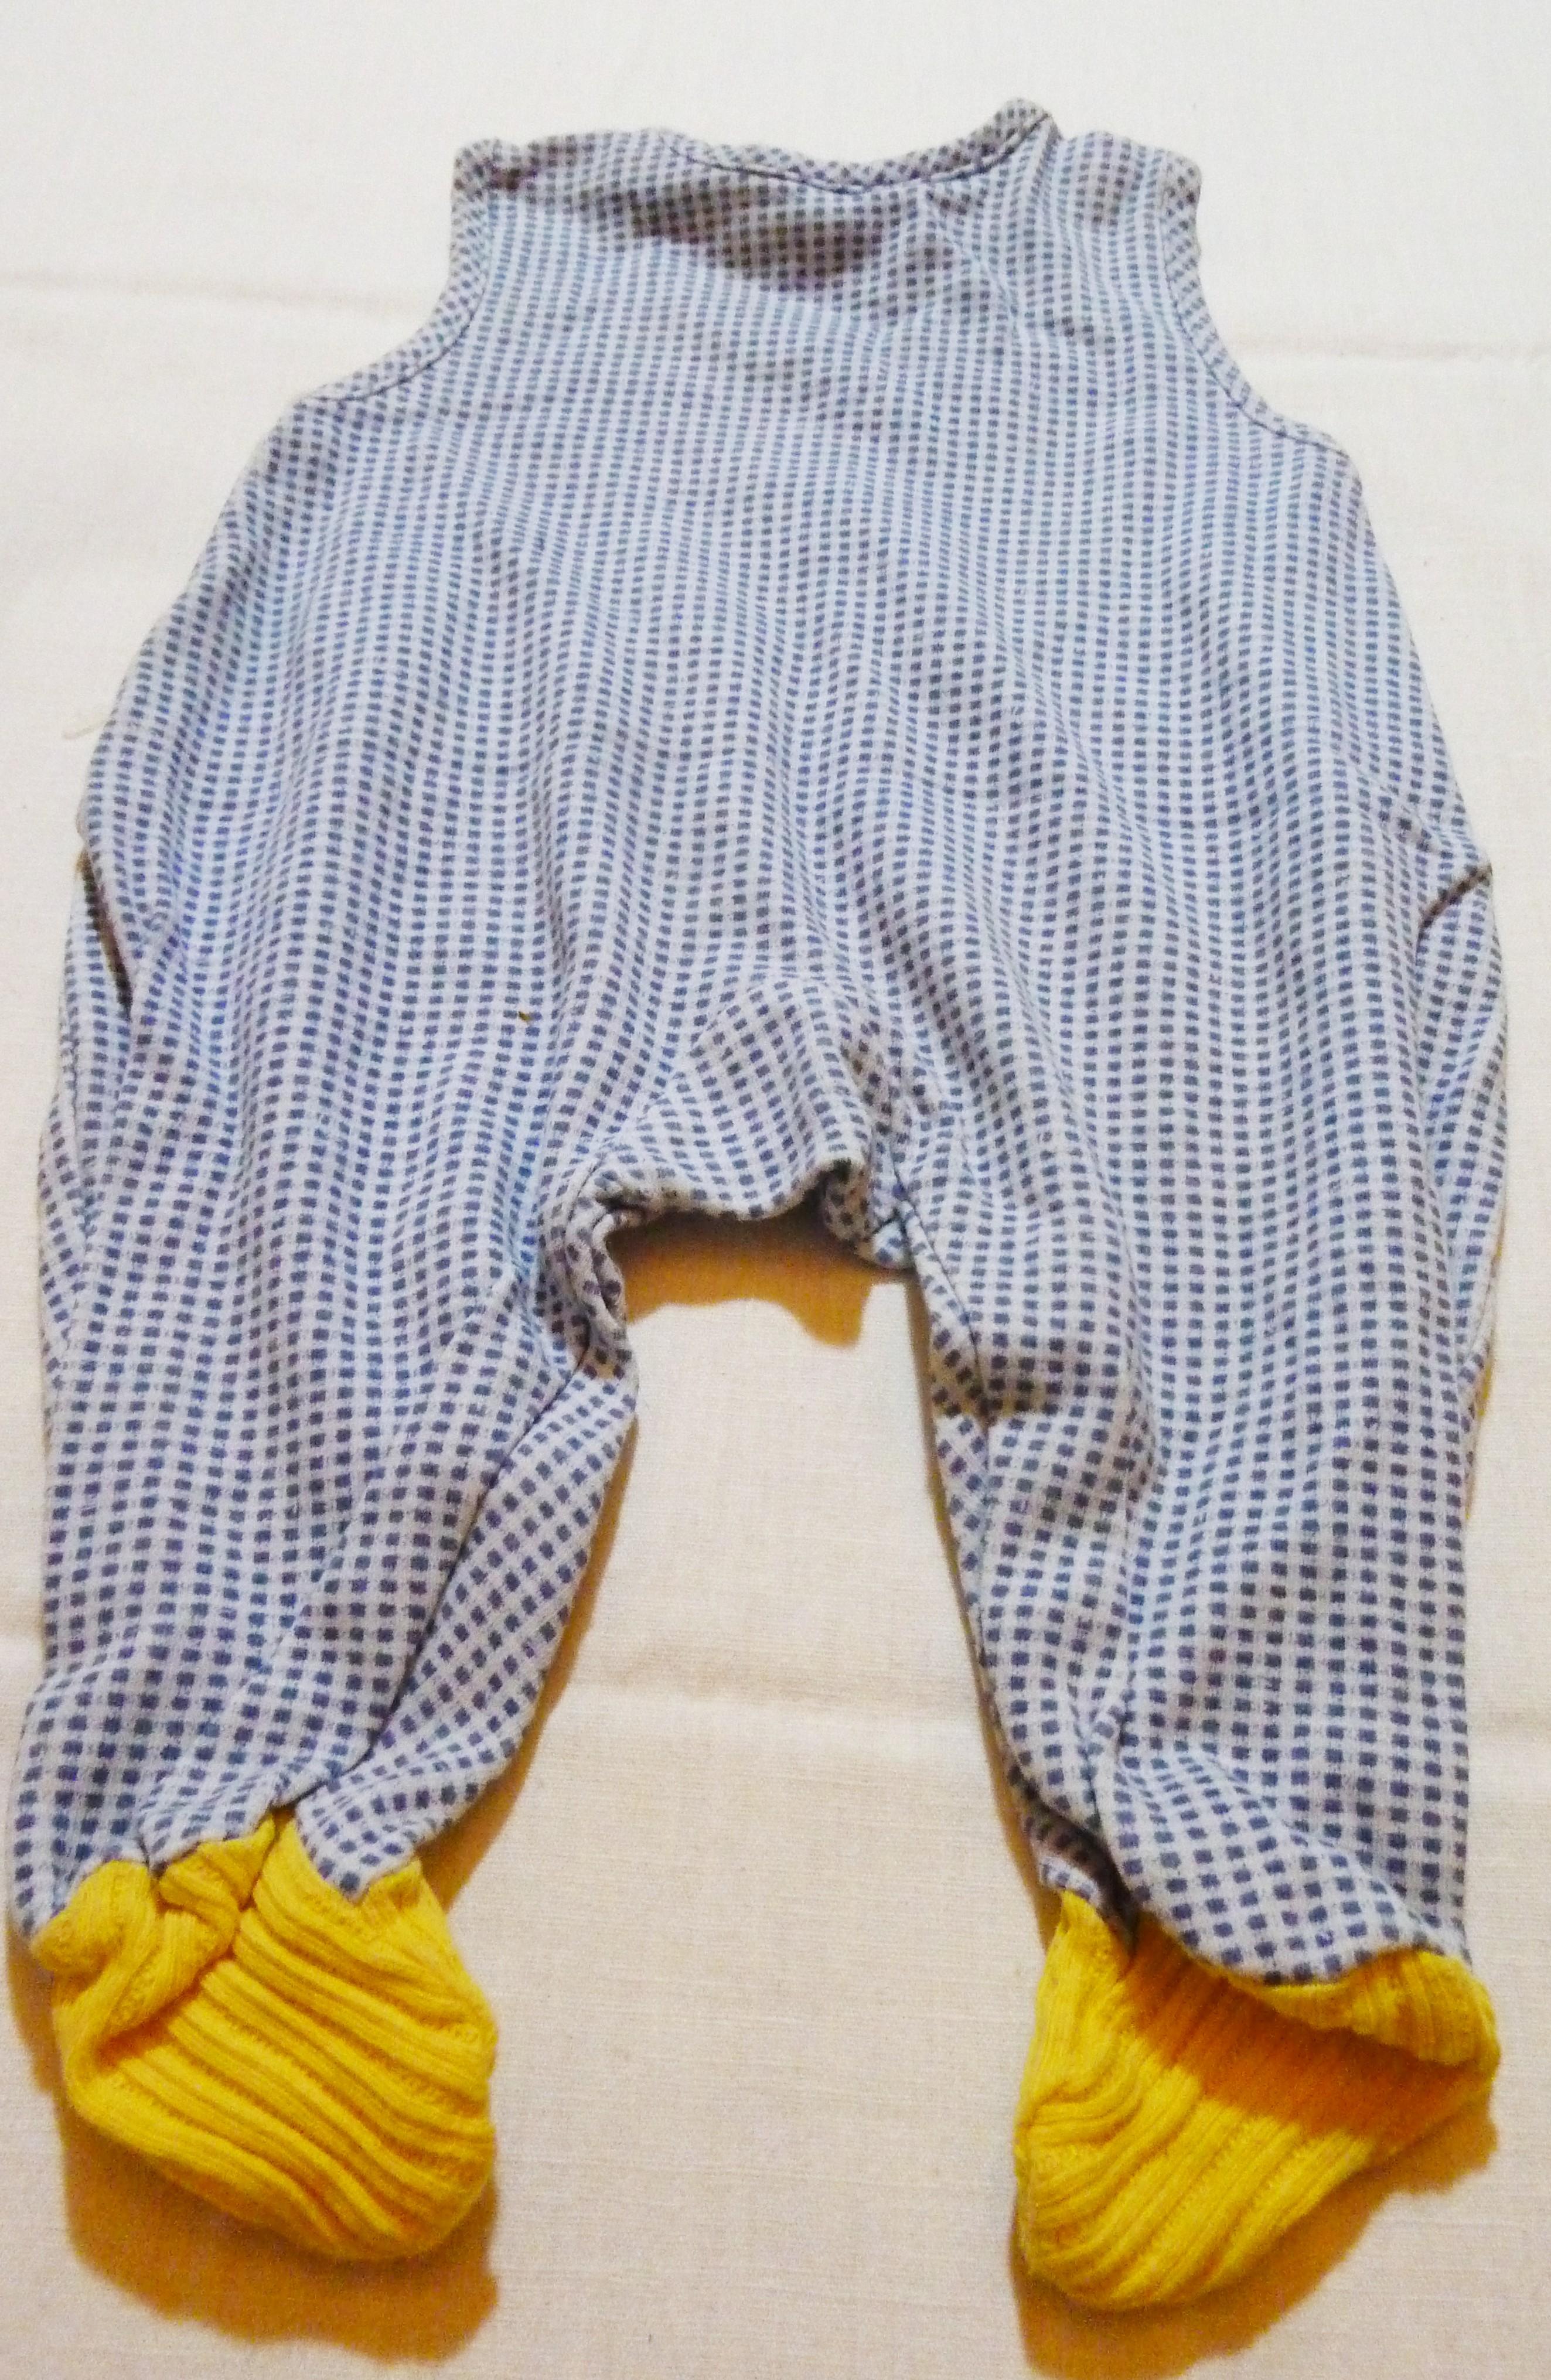 geschenk fanartikel second hand online store reusbetter strampler jungen blau gelb karo. Black Bedroom Furniture Sets. Home Design Ideas